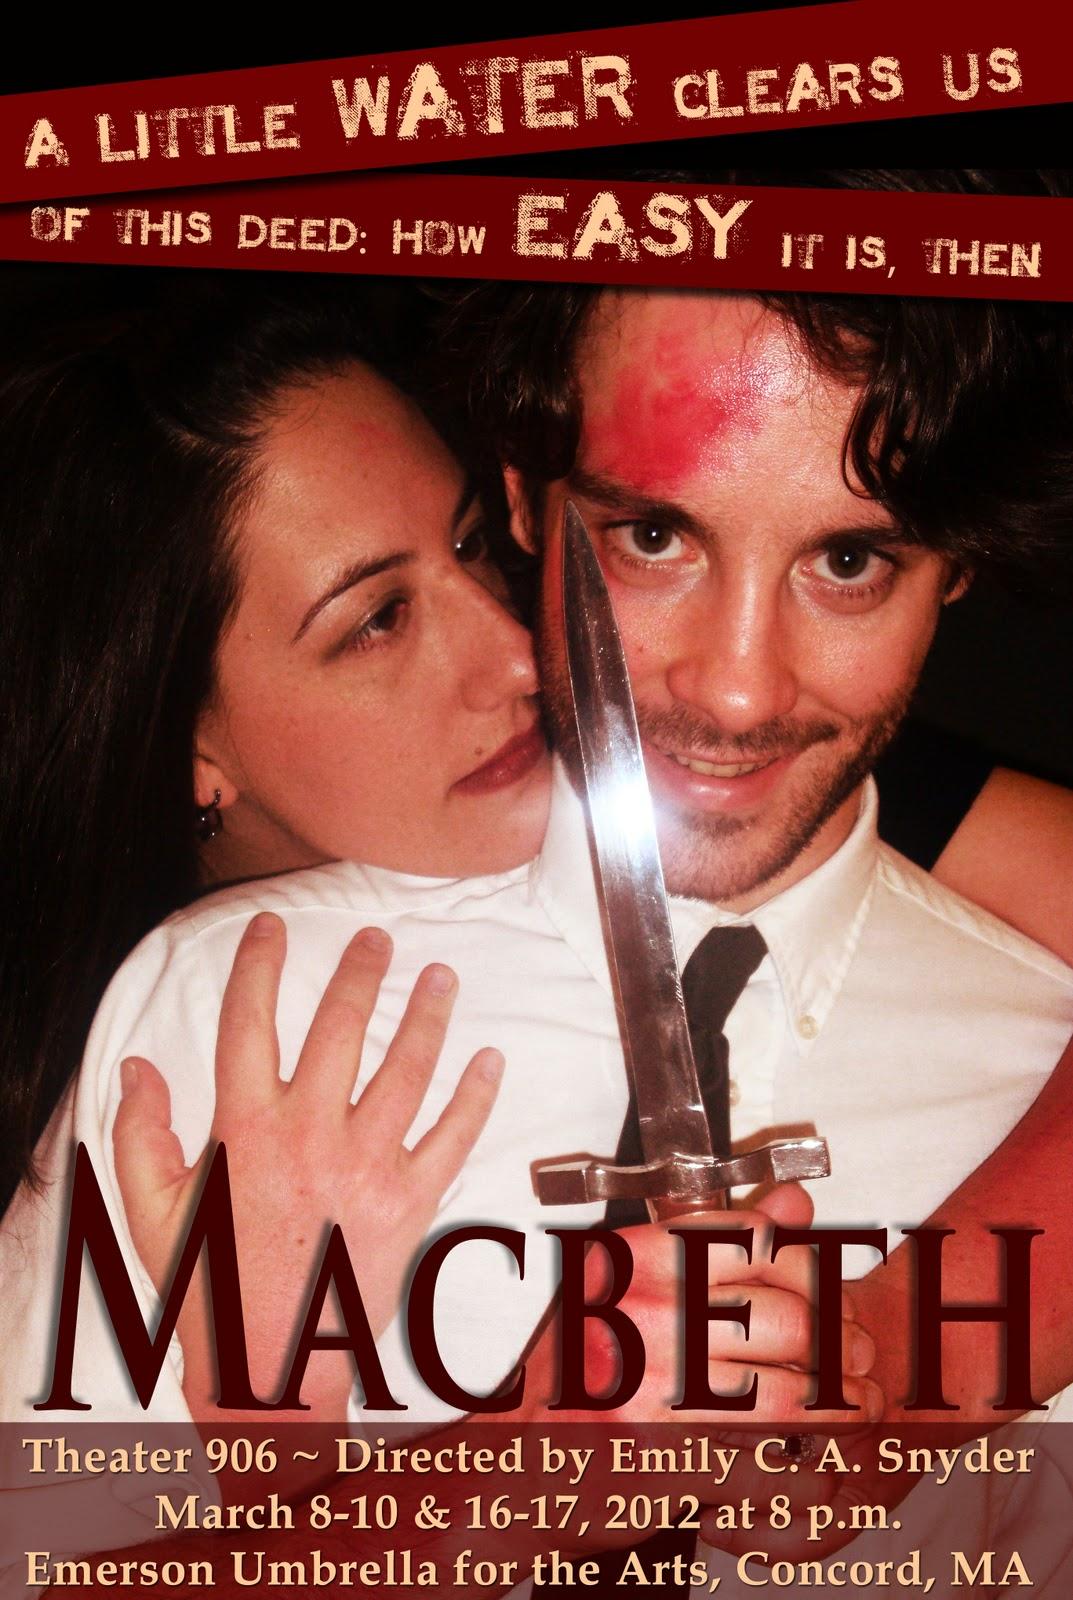 http://1.bp.blogspot.com/-sW4X-wO0H3Y/TyjdZqeVr_I/AAAAAAAAAig/wyAJ6rxTaAk/s1600/Macbeth%2BPublicity%2BPoster.jpg